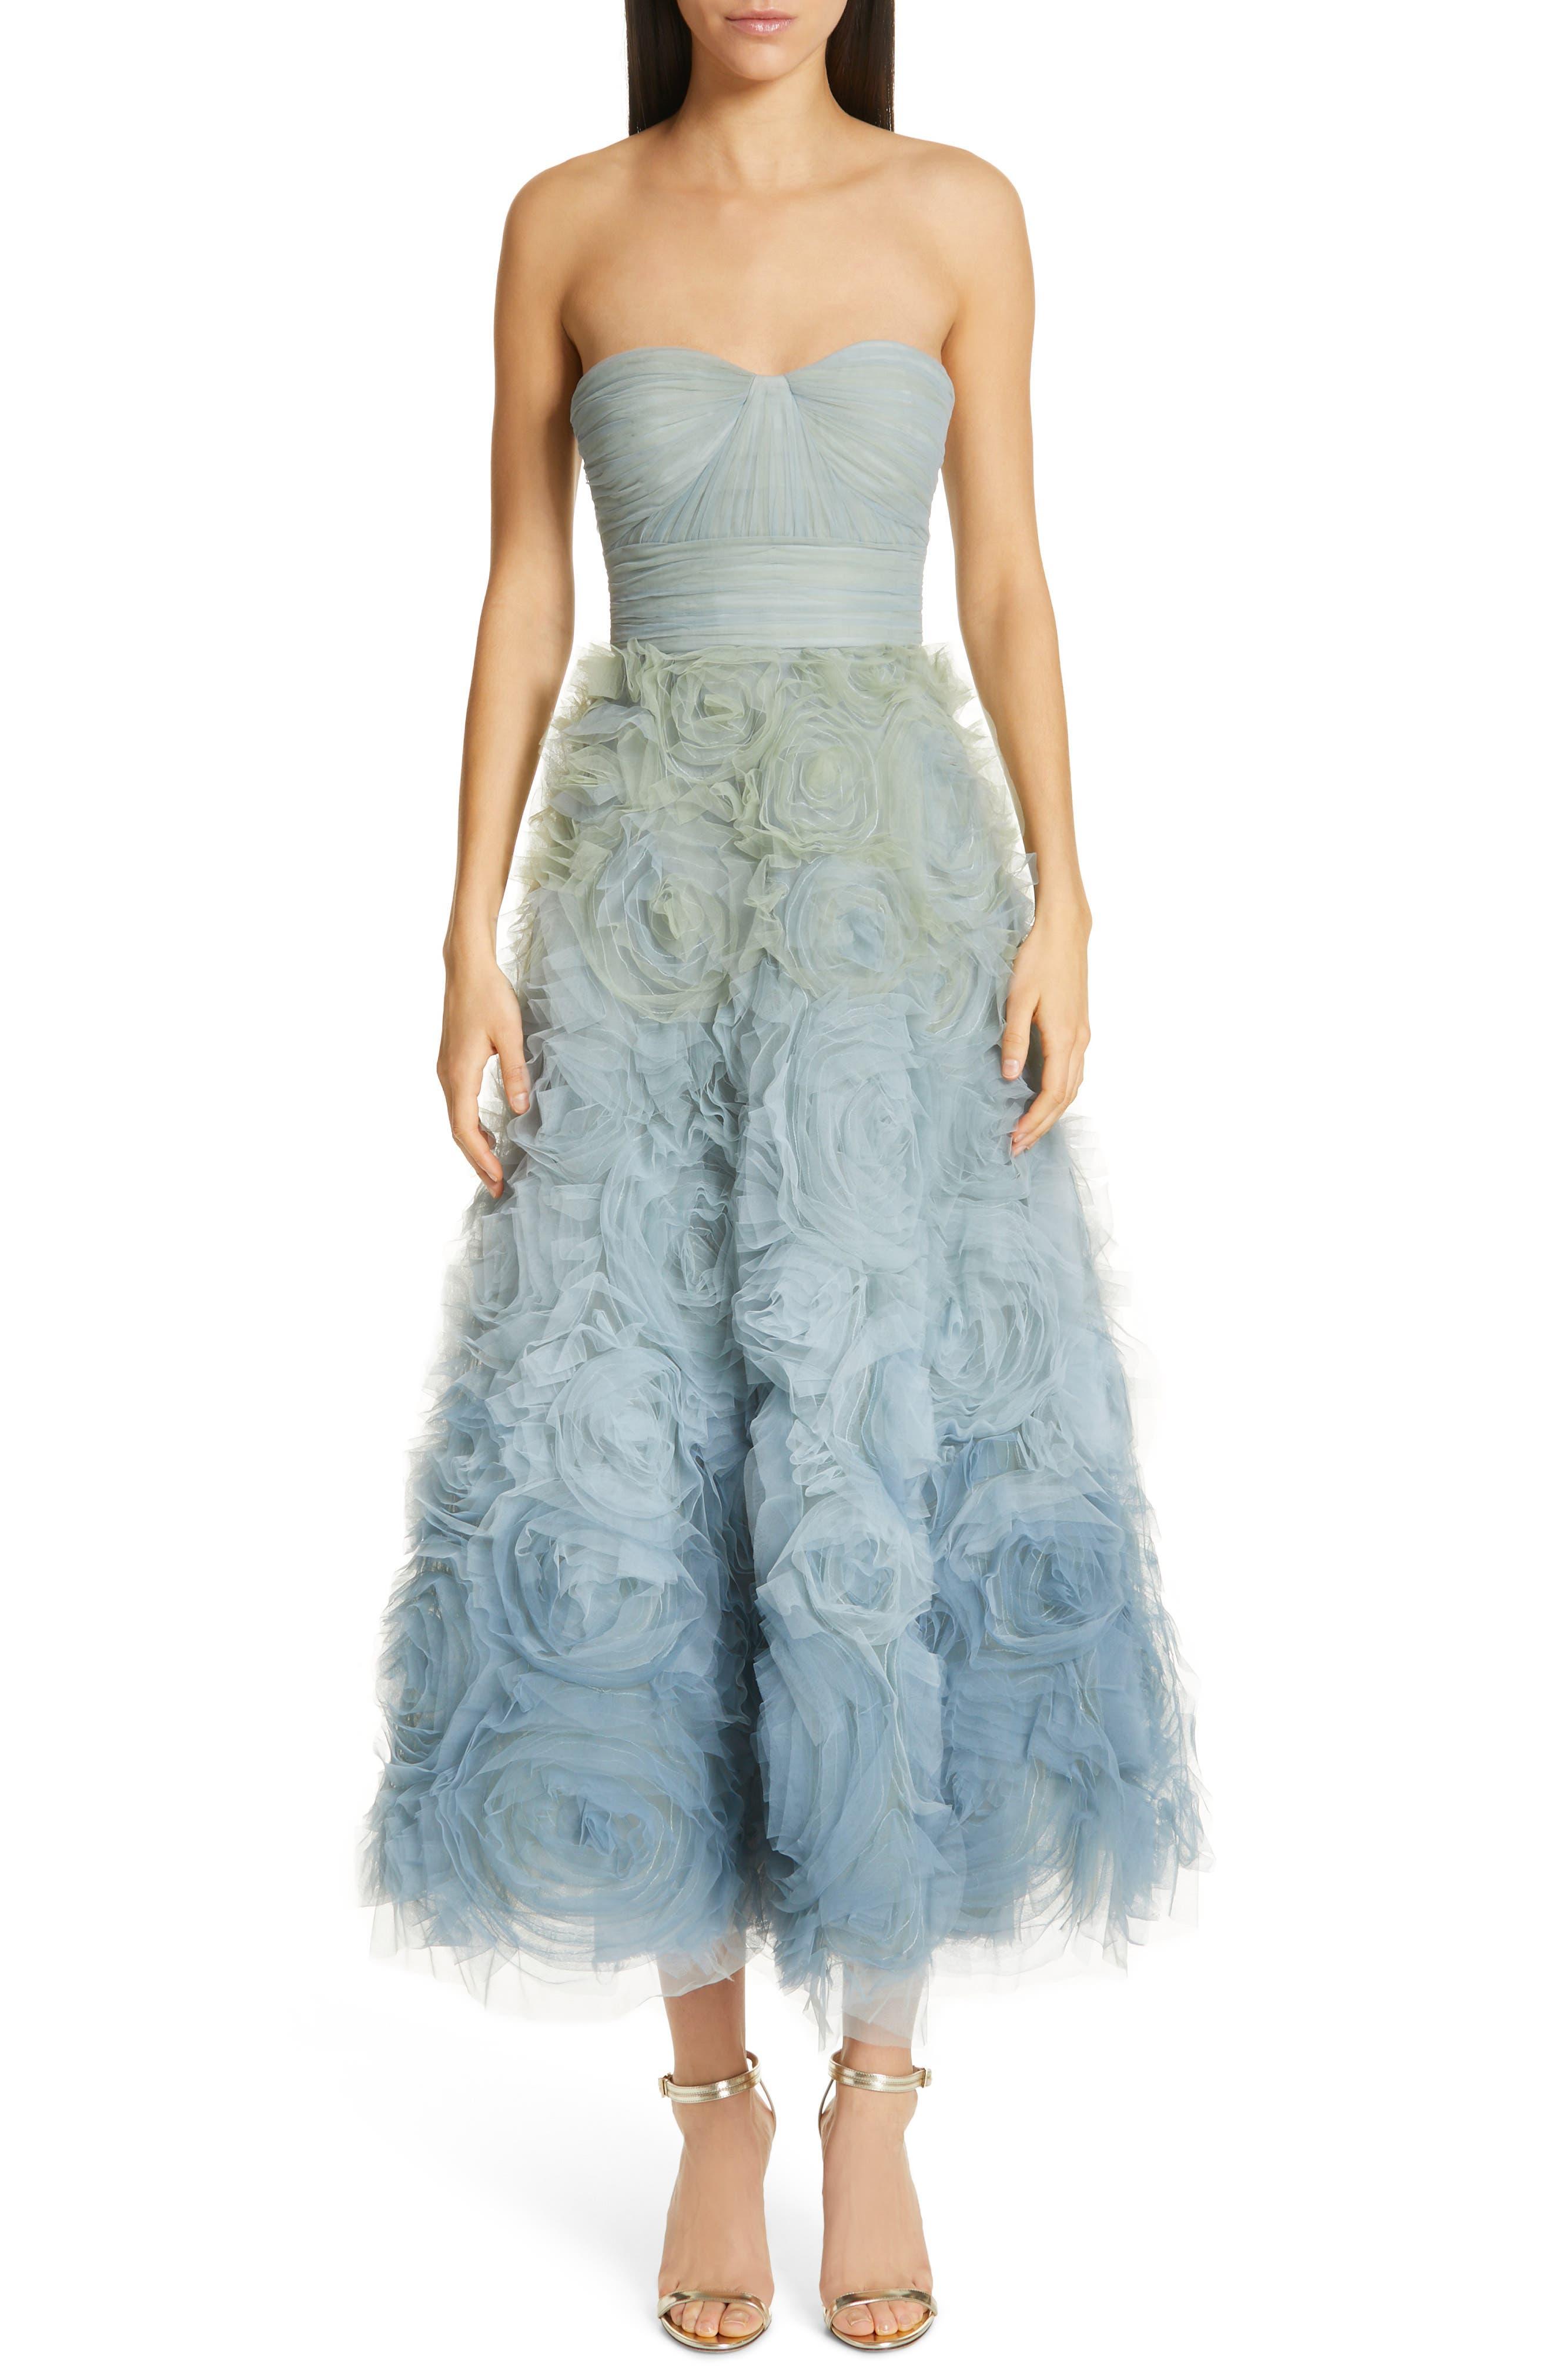 Marchesa Notte Ombre Strapless Evening Dress